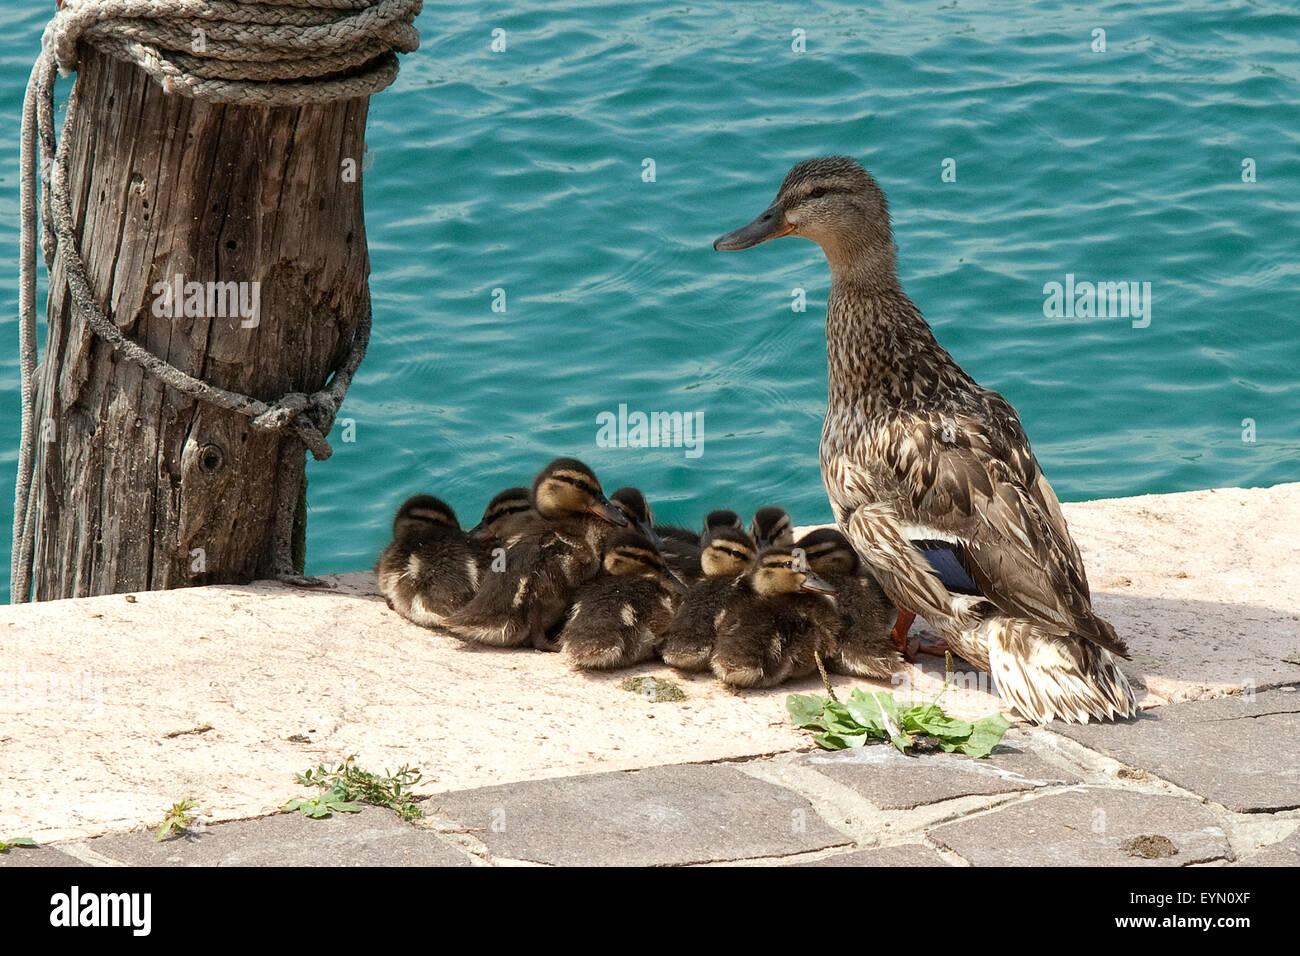 Junge, Wildenten, Anas platyrhynchos, Enten,, Imagens de Stock